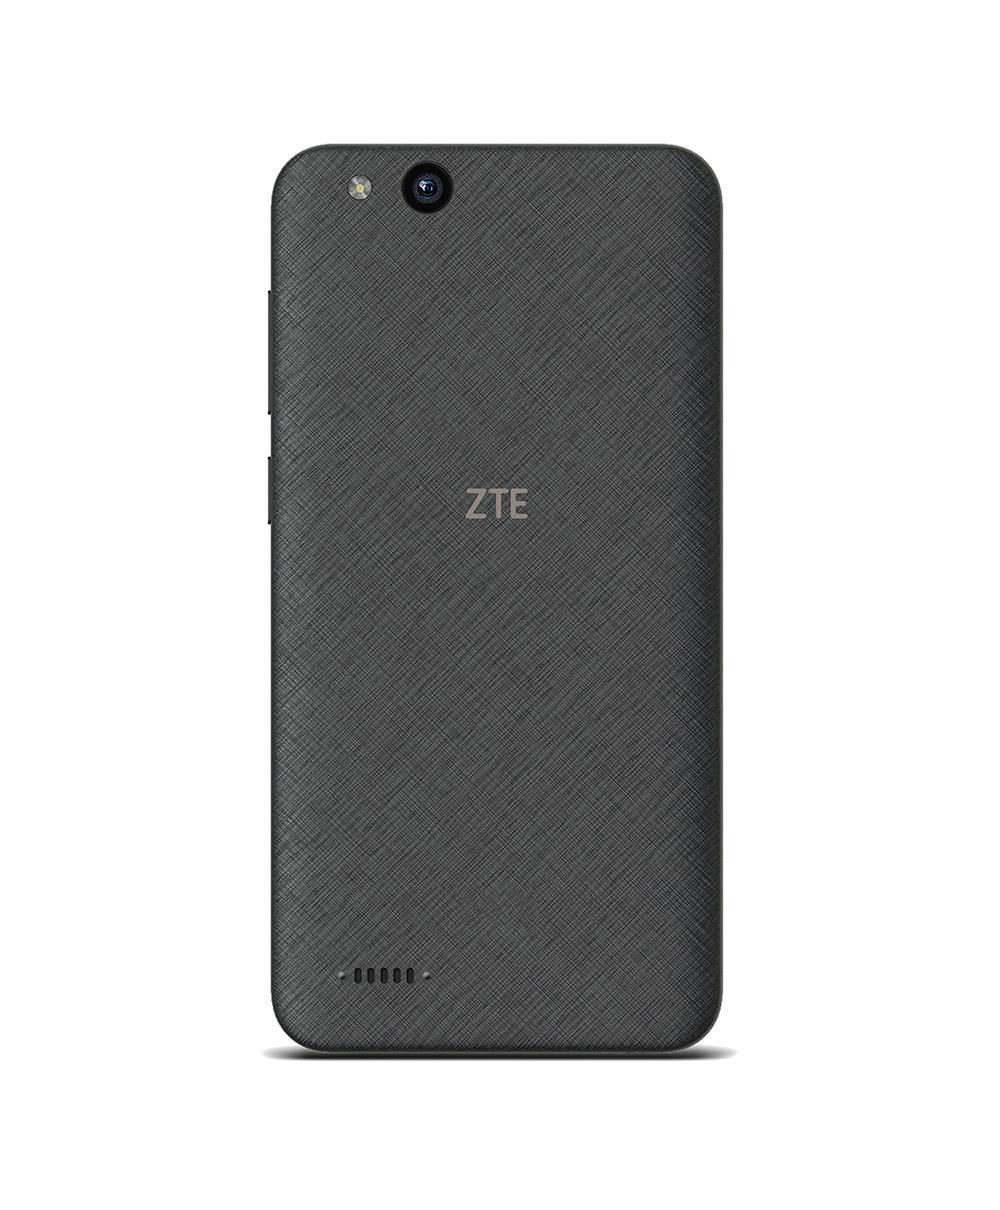 Zte Z3001s Phone Features – A Murti Schofield